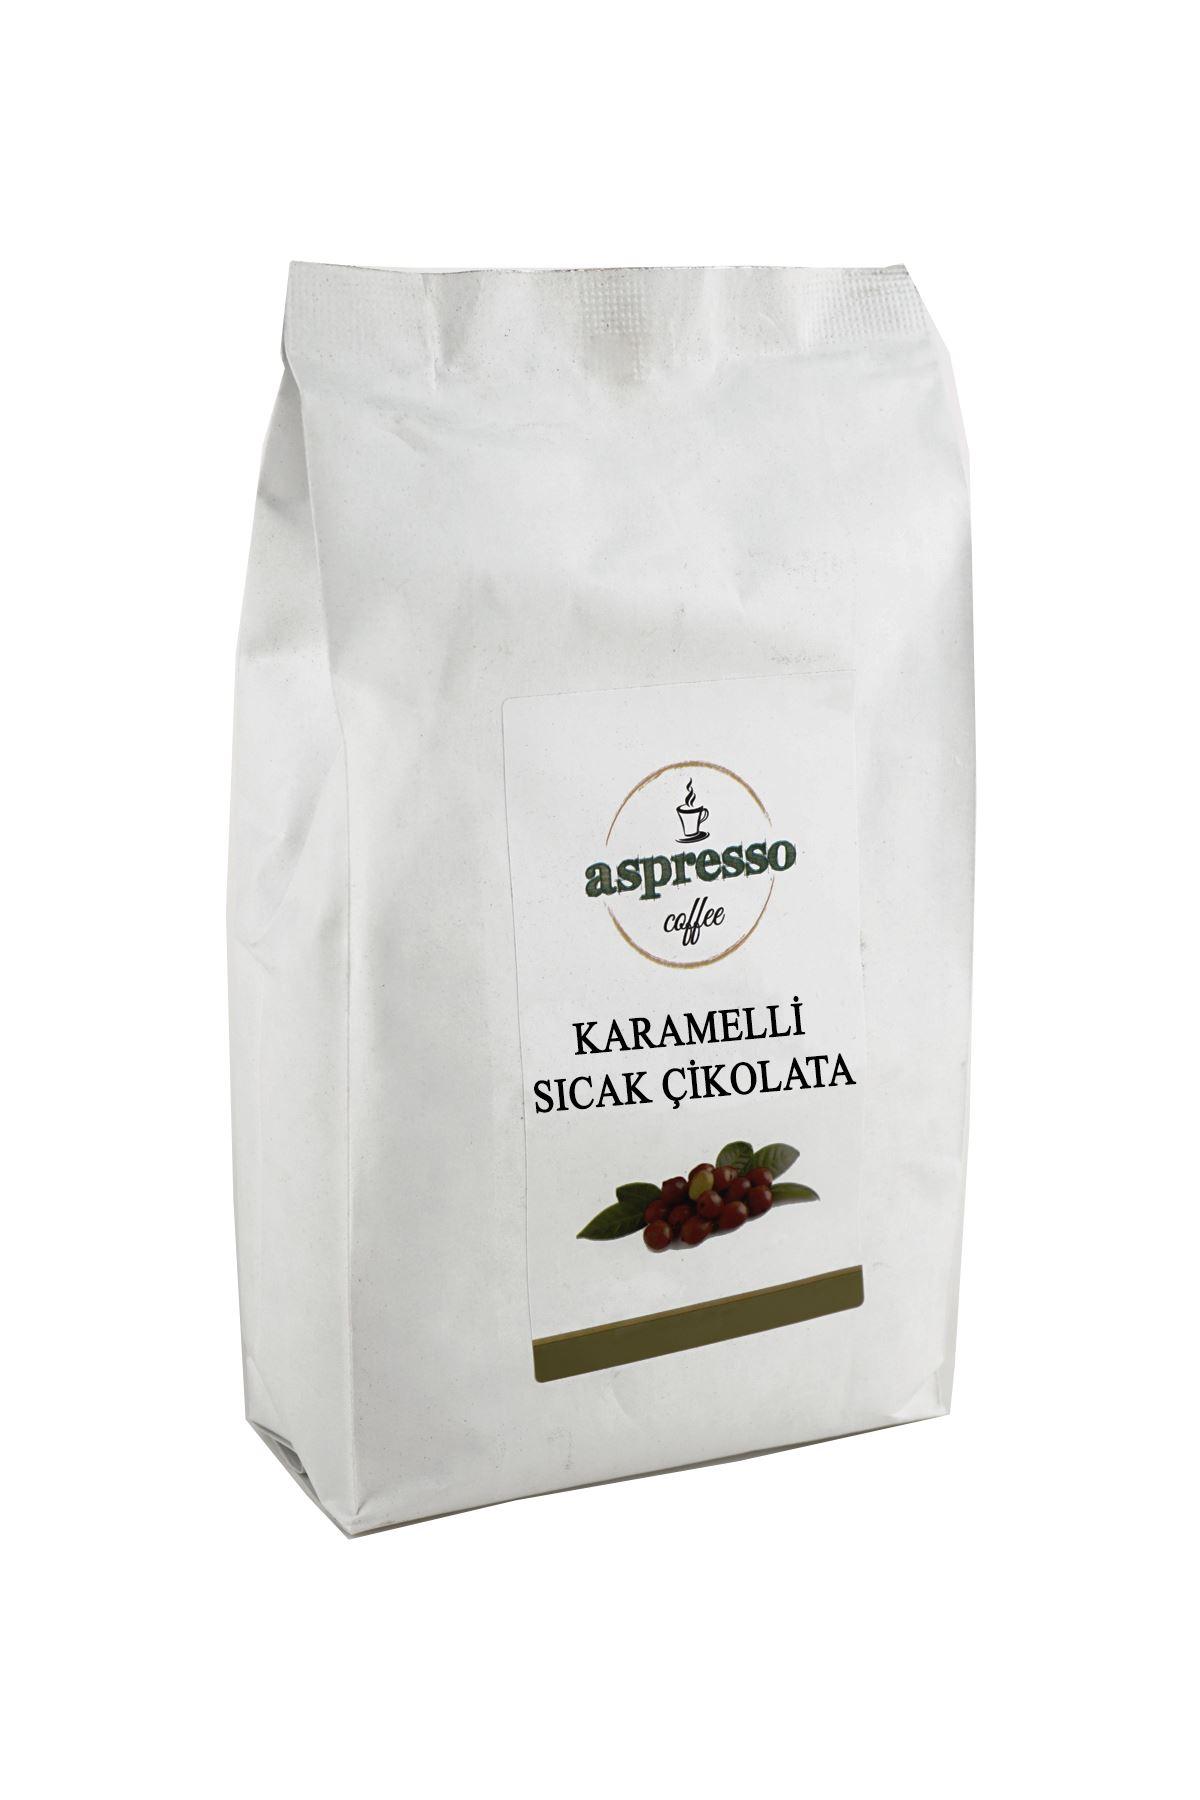 Karamel Sıcak Çikolata 1000 gr.